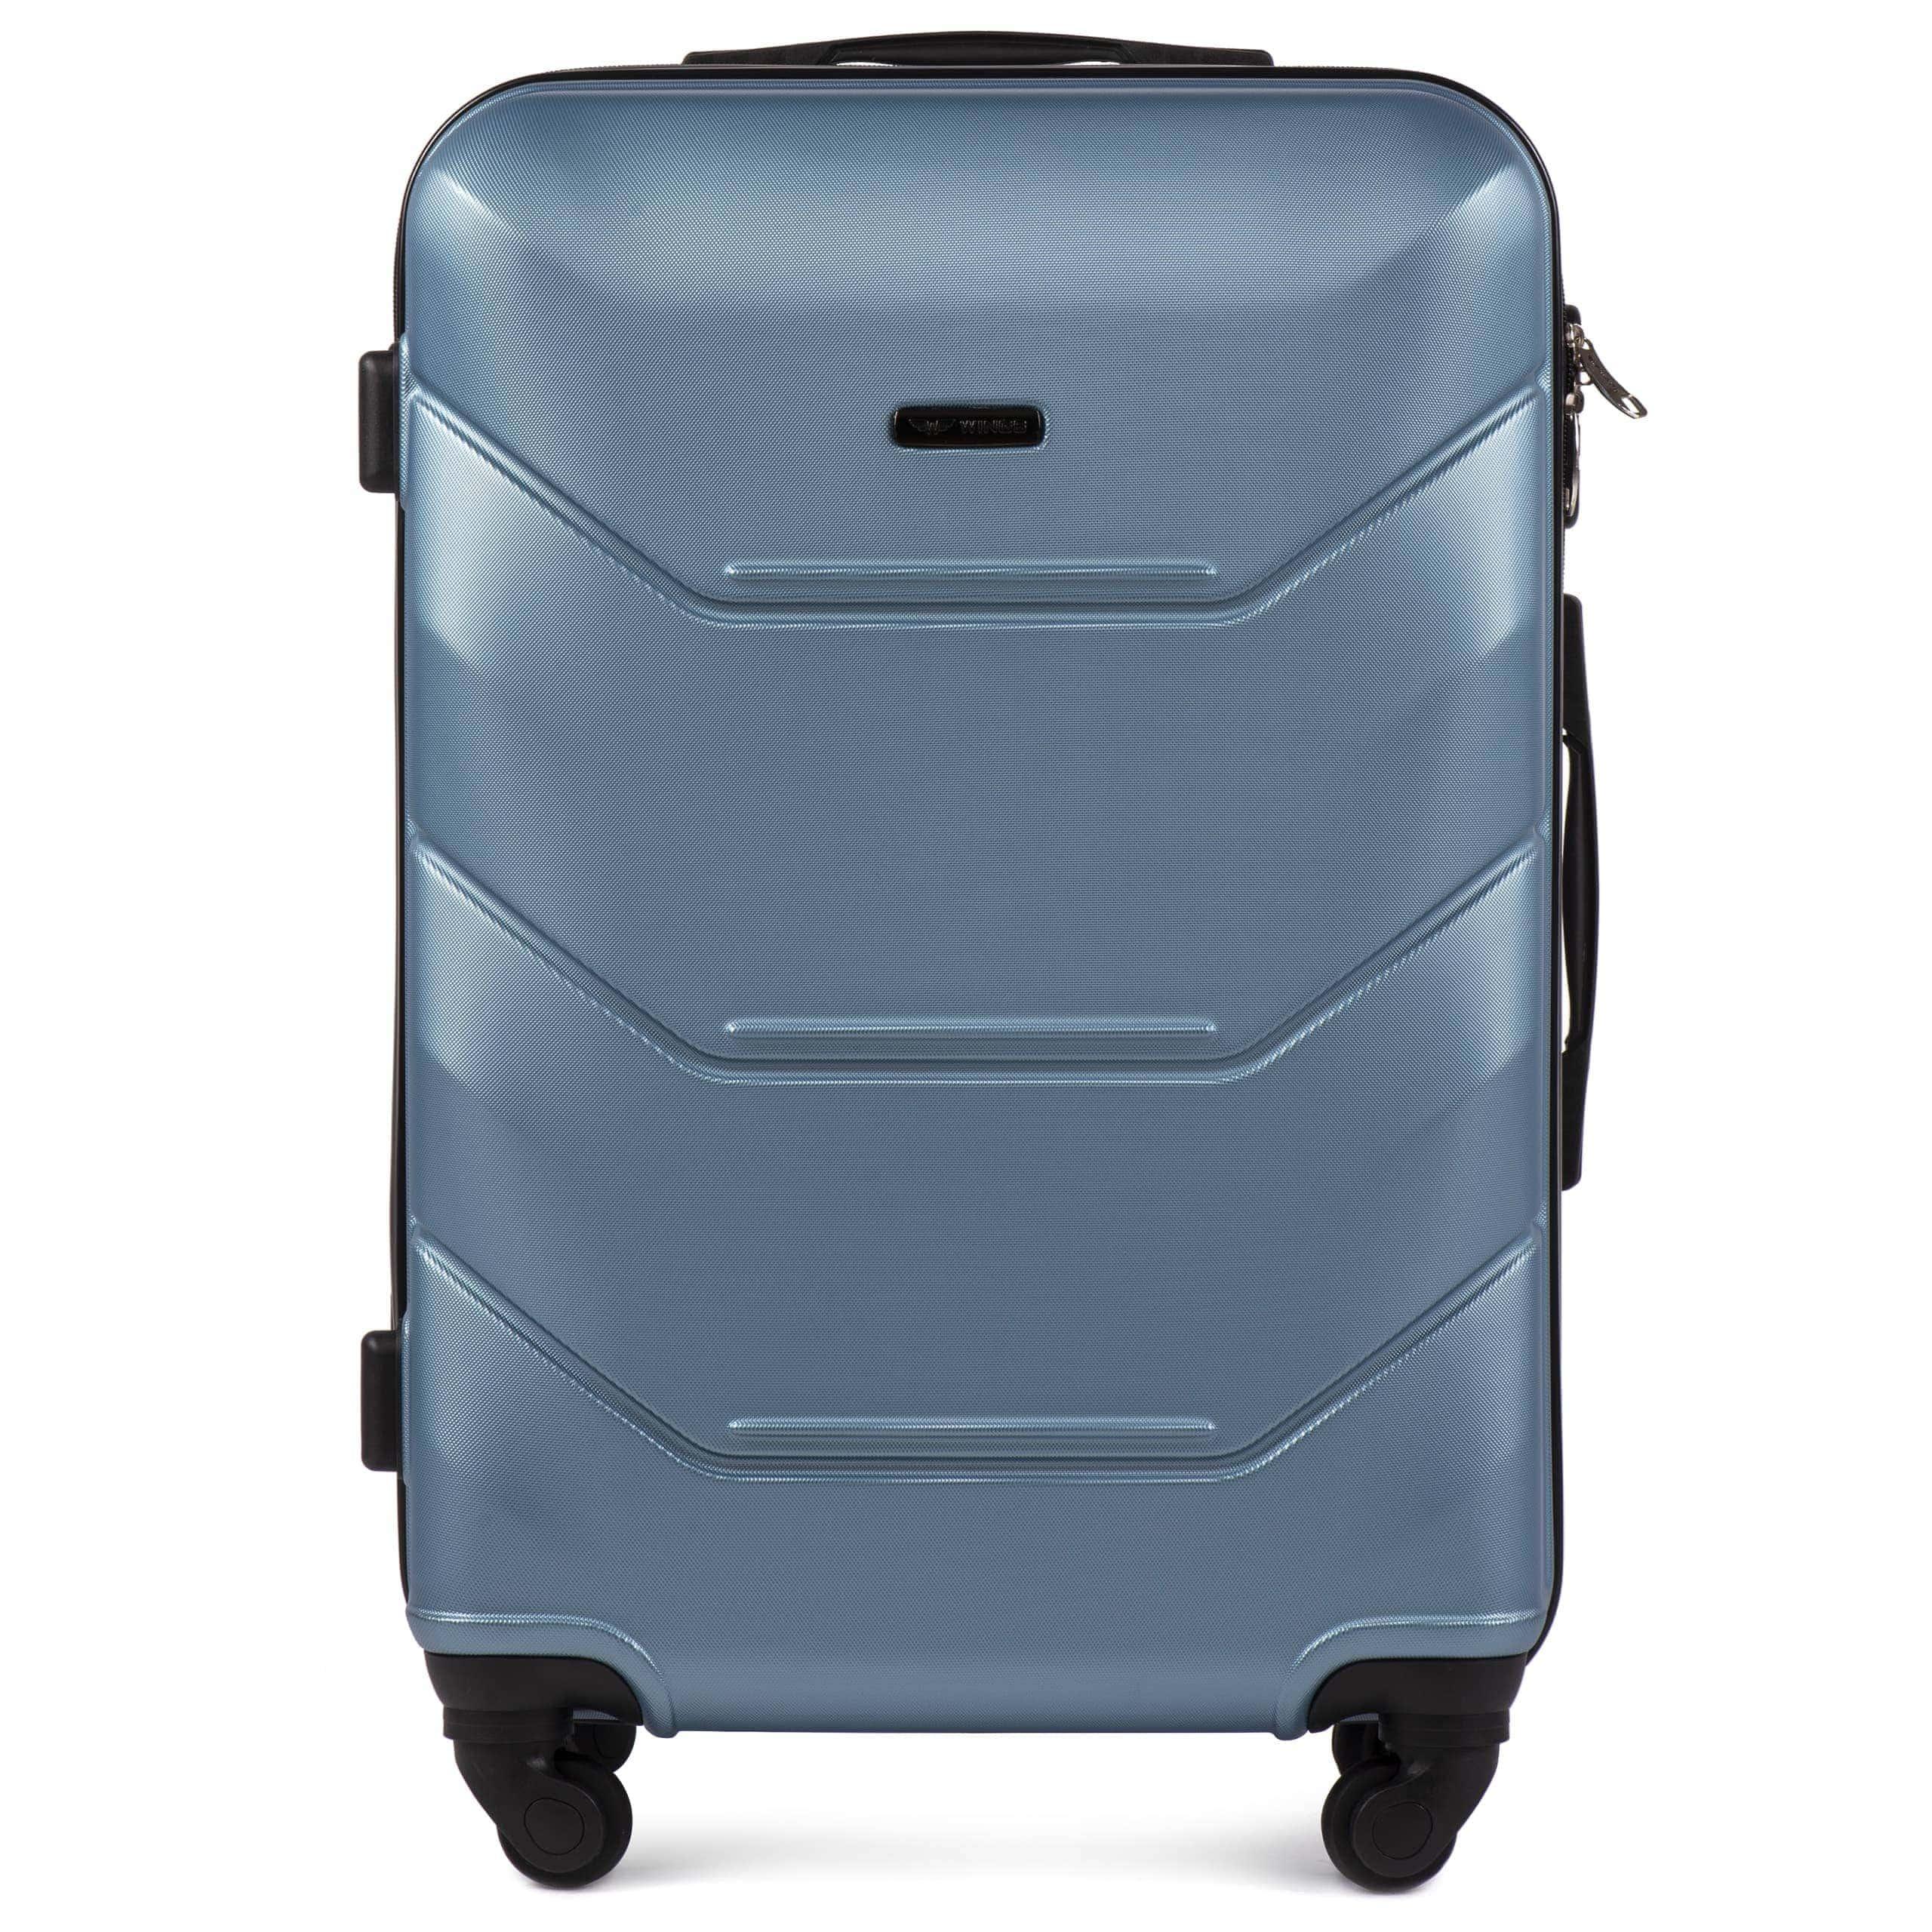 БОЛЬШОЙ ЧЕМОДАН WINGS 147 L BLUE-SILVER PREMIUM НА 4-Х КАУЧУКОВЫХ КОЛЕСАХ! Для багажа ,до 23 кг